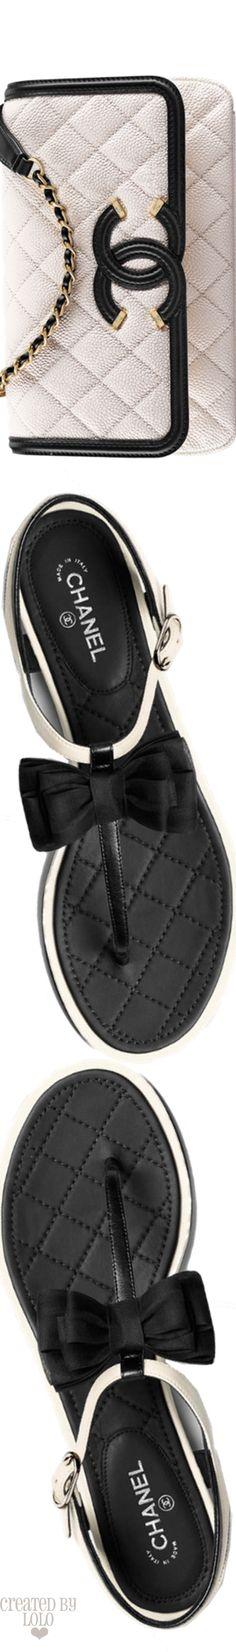 Chanel S/S 2017 Pre-Collection Handbags/